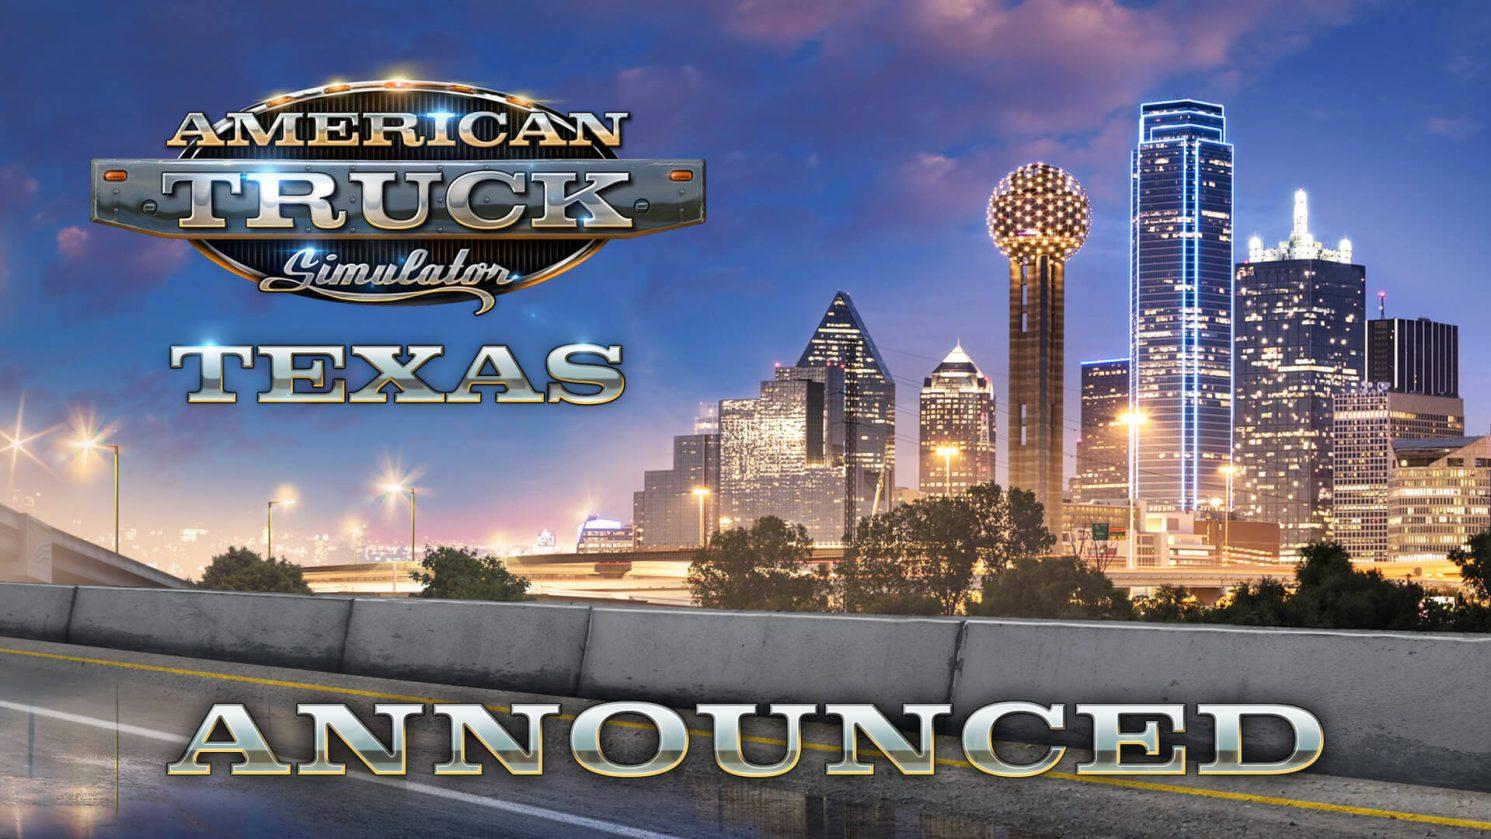 American Truck Simulatro Texas 1